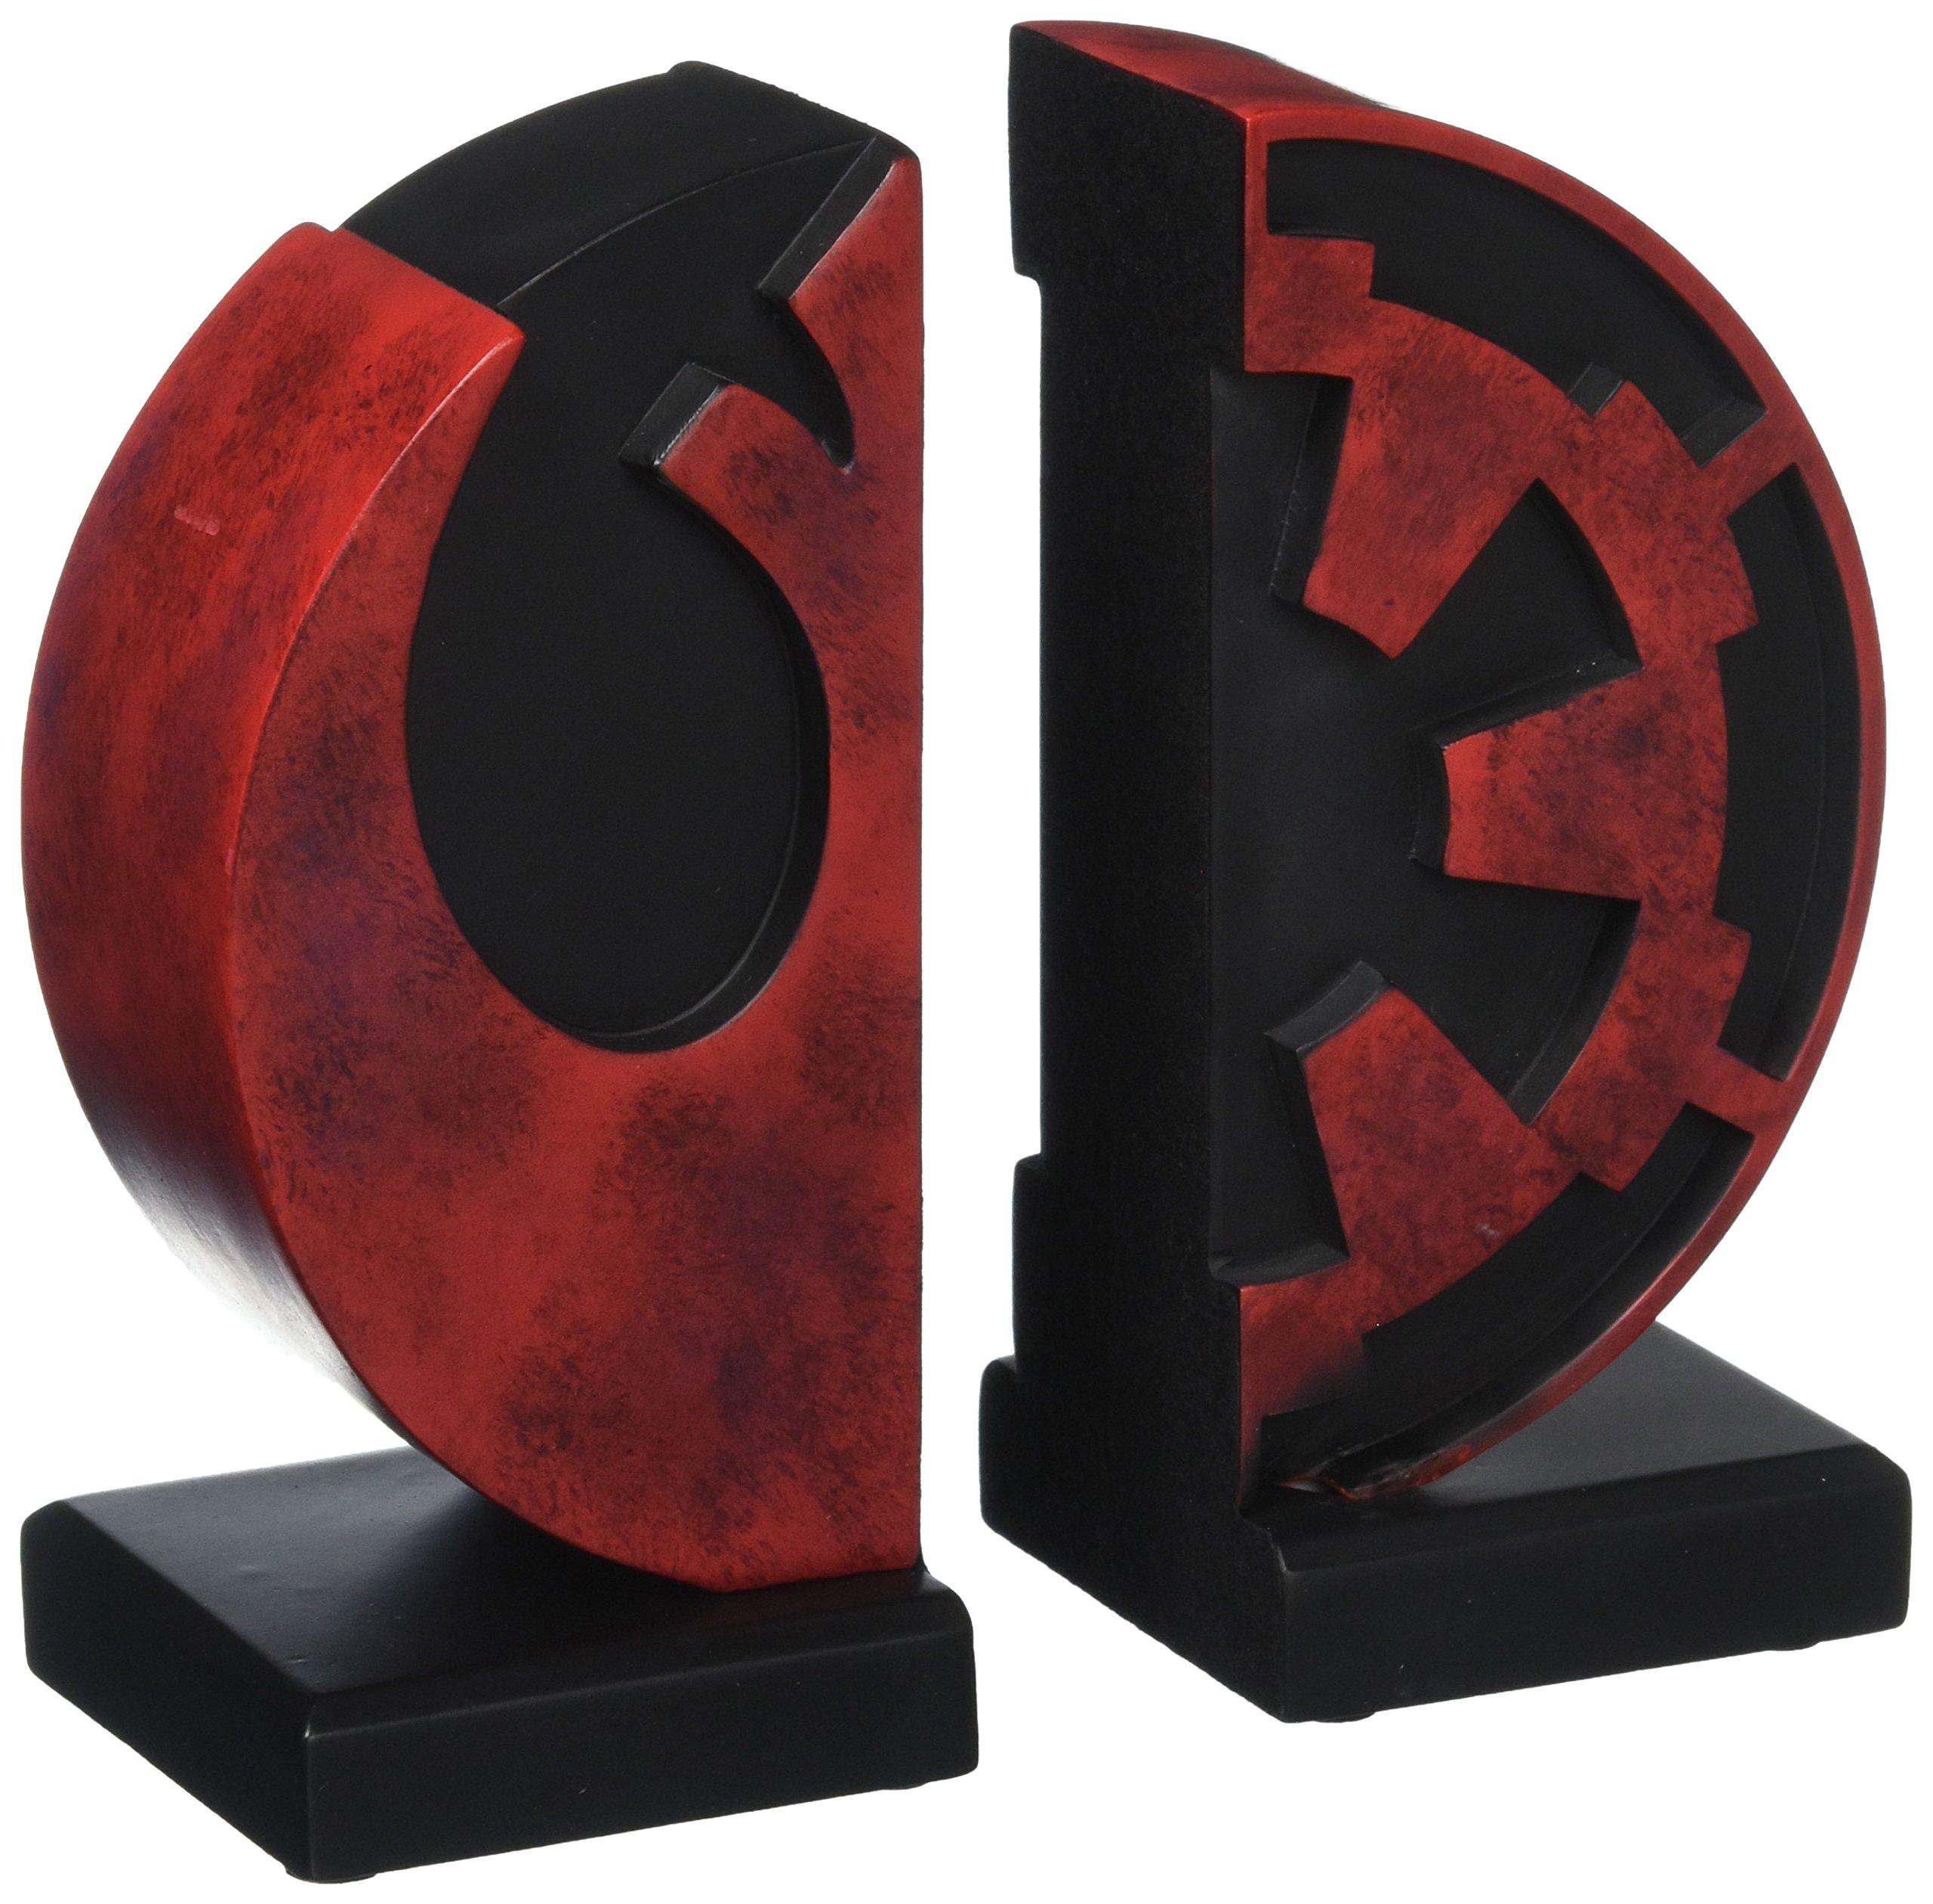 Gentle Giant Studios Star Wars: Imperial Rebel Logo Resin Bookends